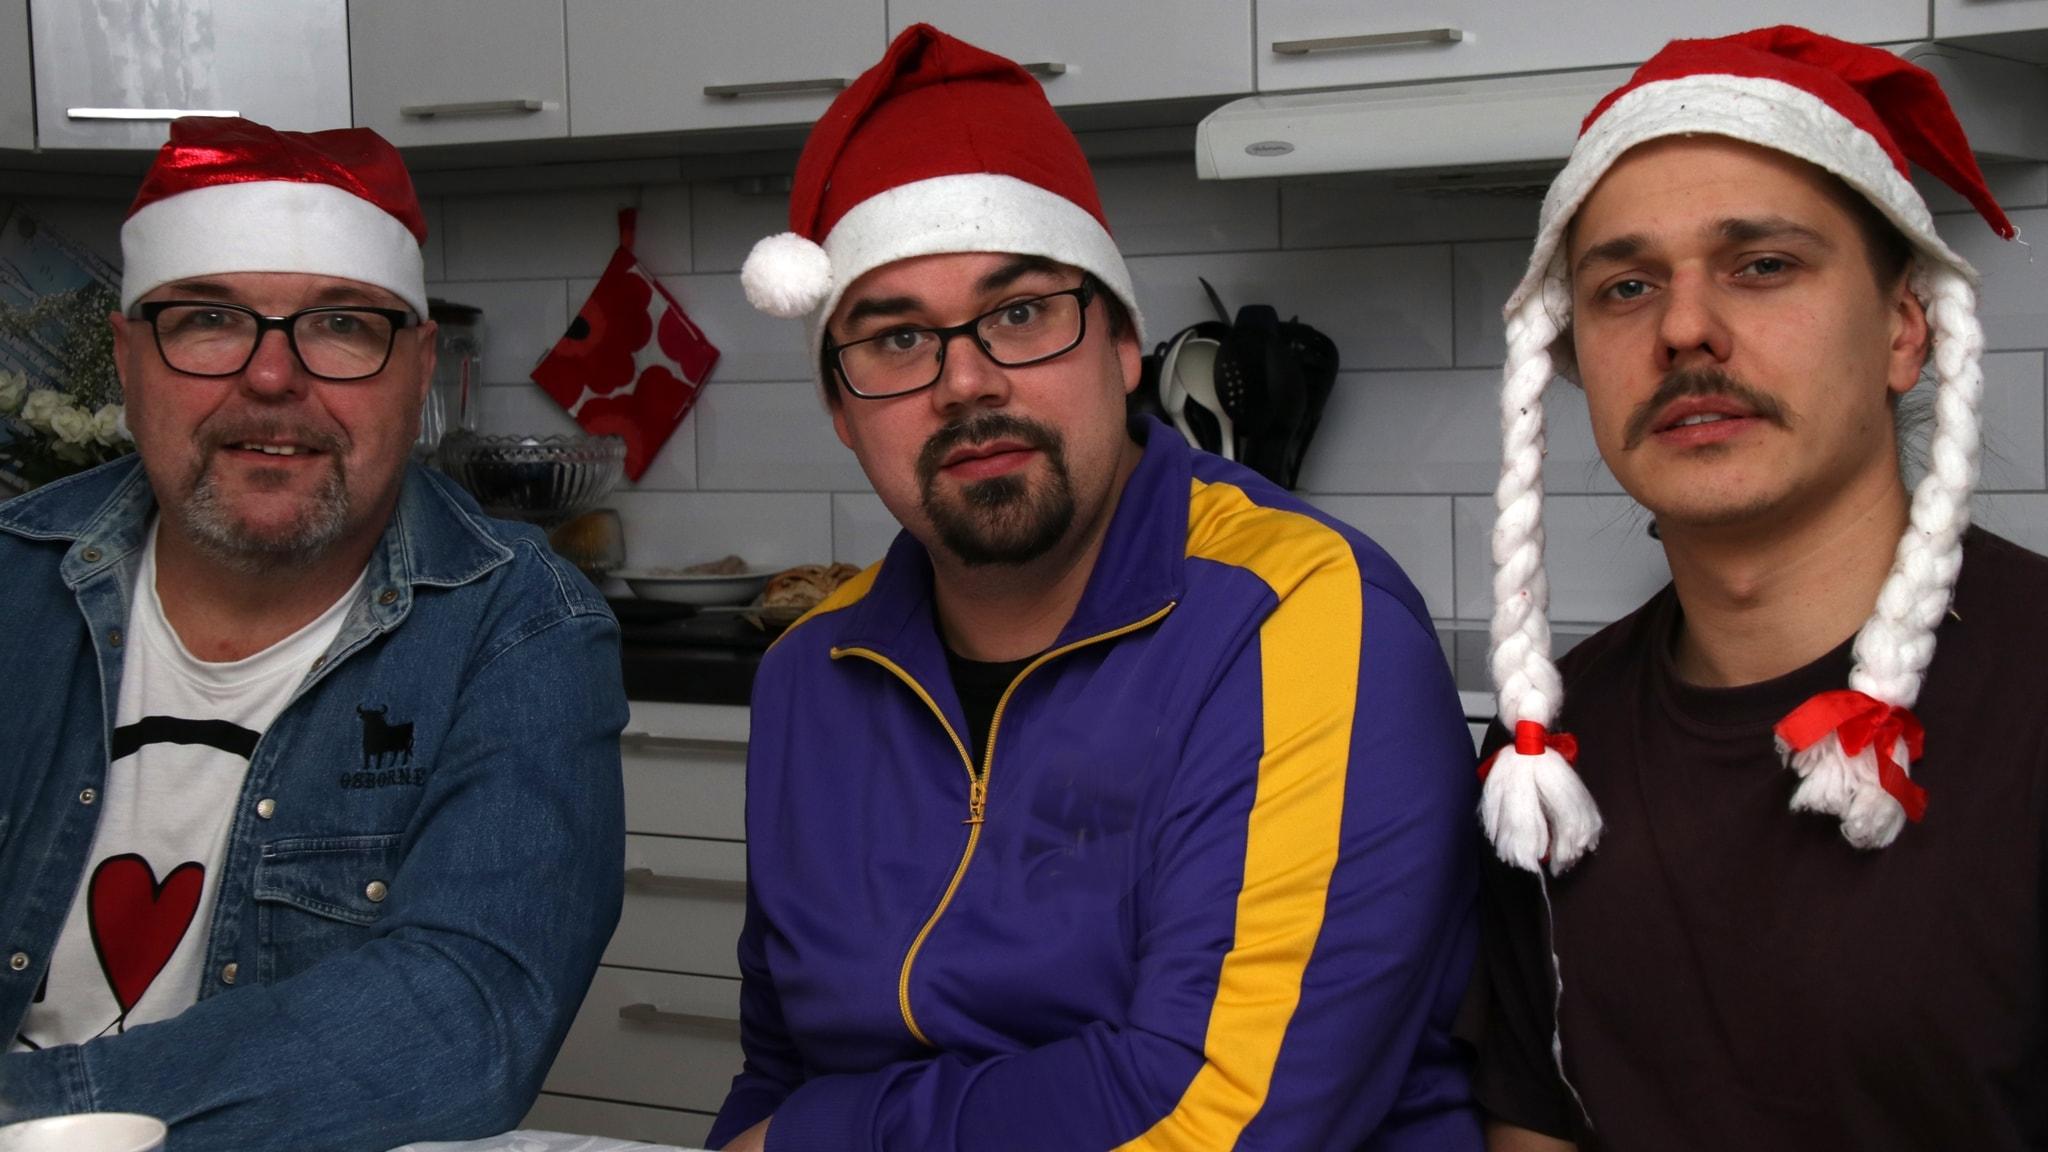 Joulupukit tarinoivat mukavia